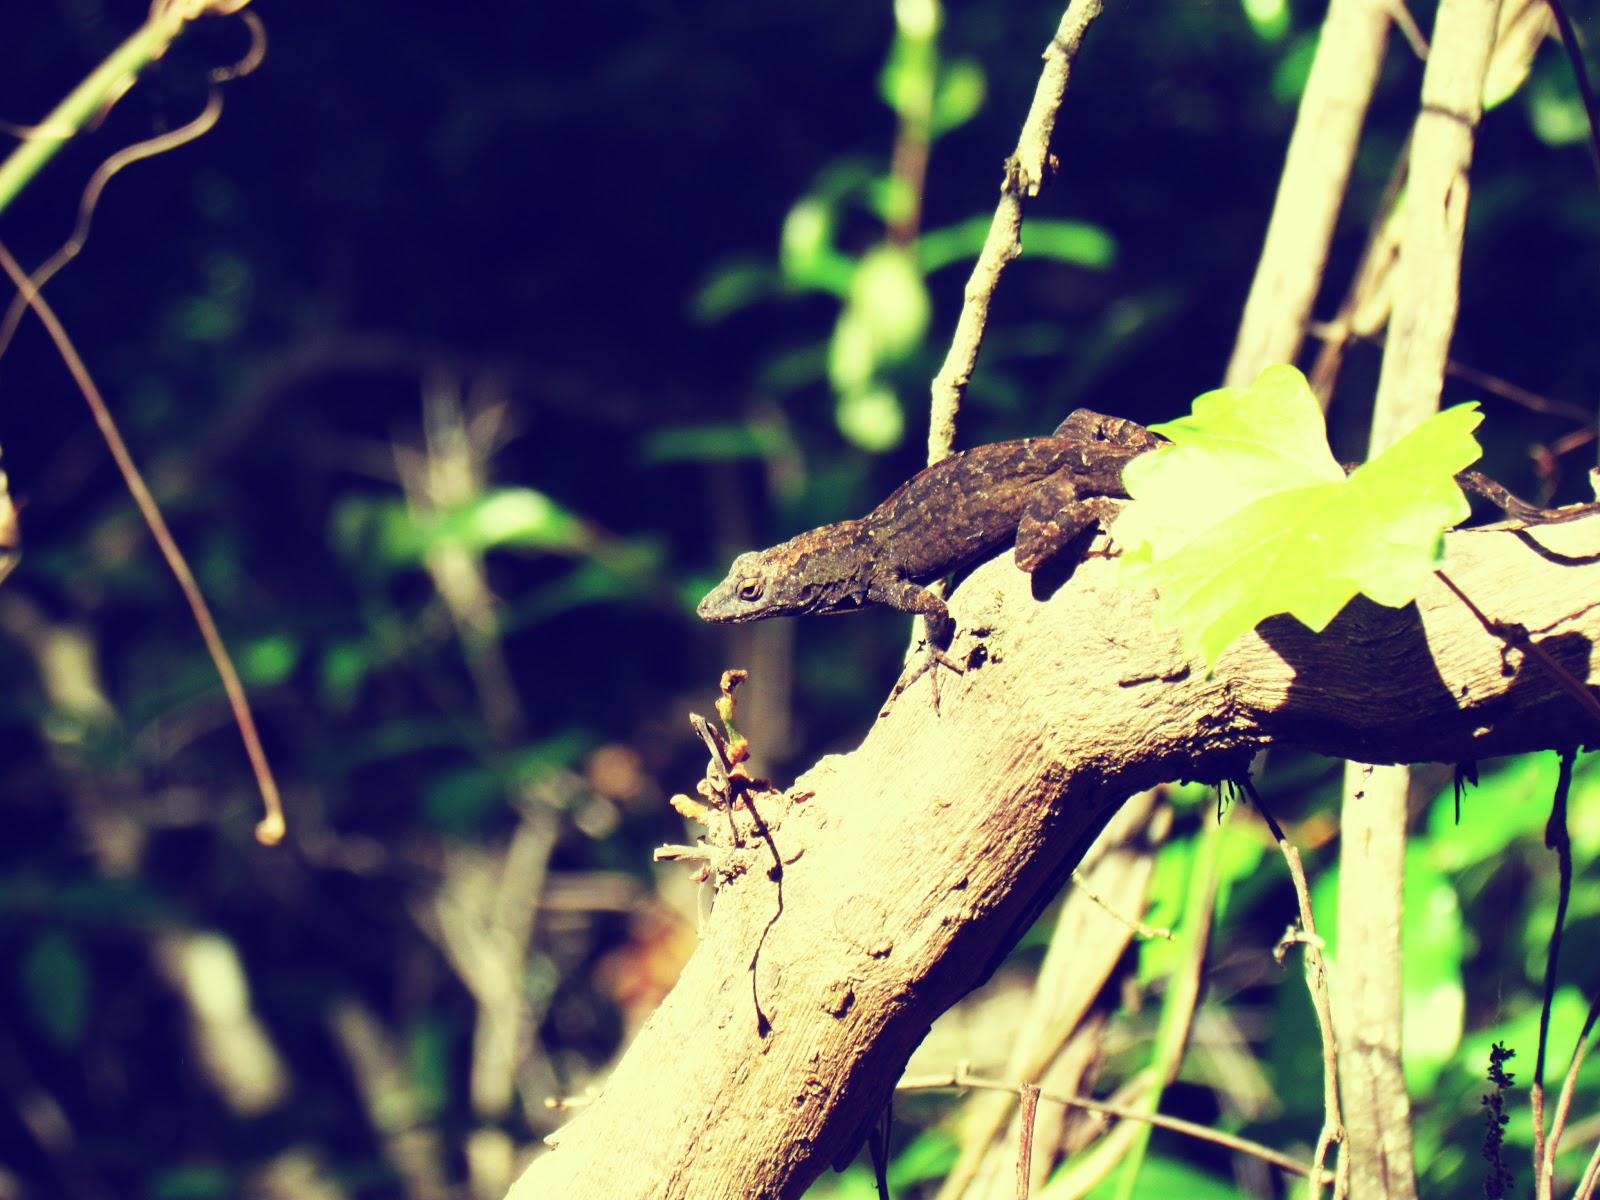 A lizard hanging in the forest on a brambling tree branch in Hammock Park in Dunedin, Florida Near Honeymoon Island